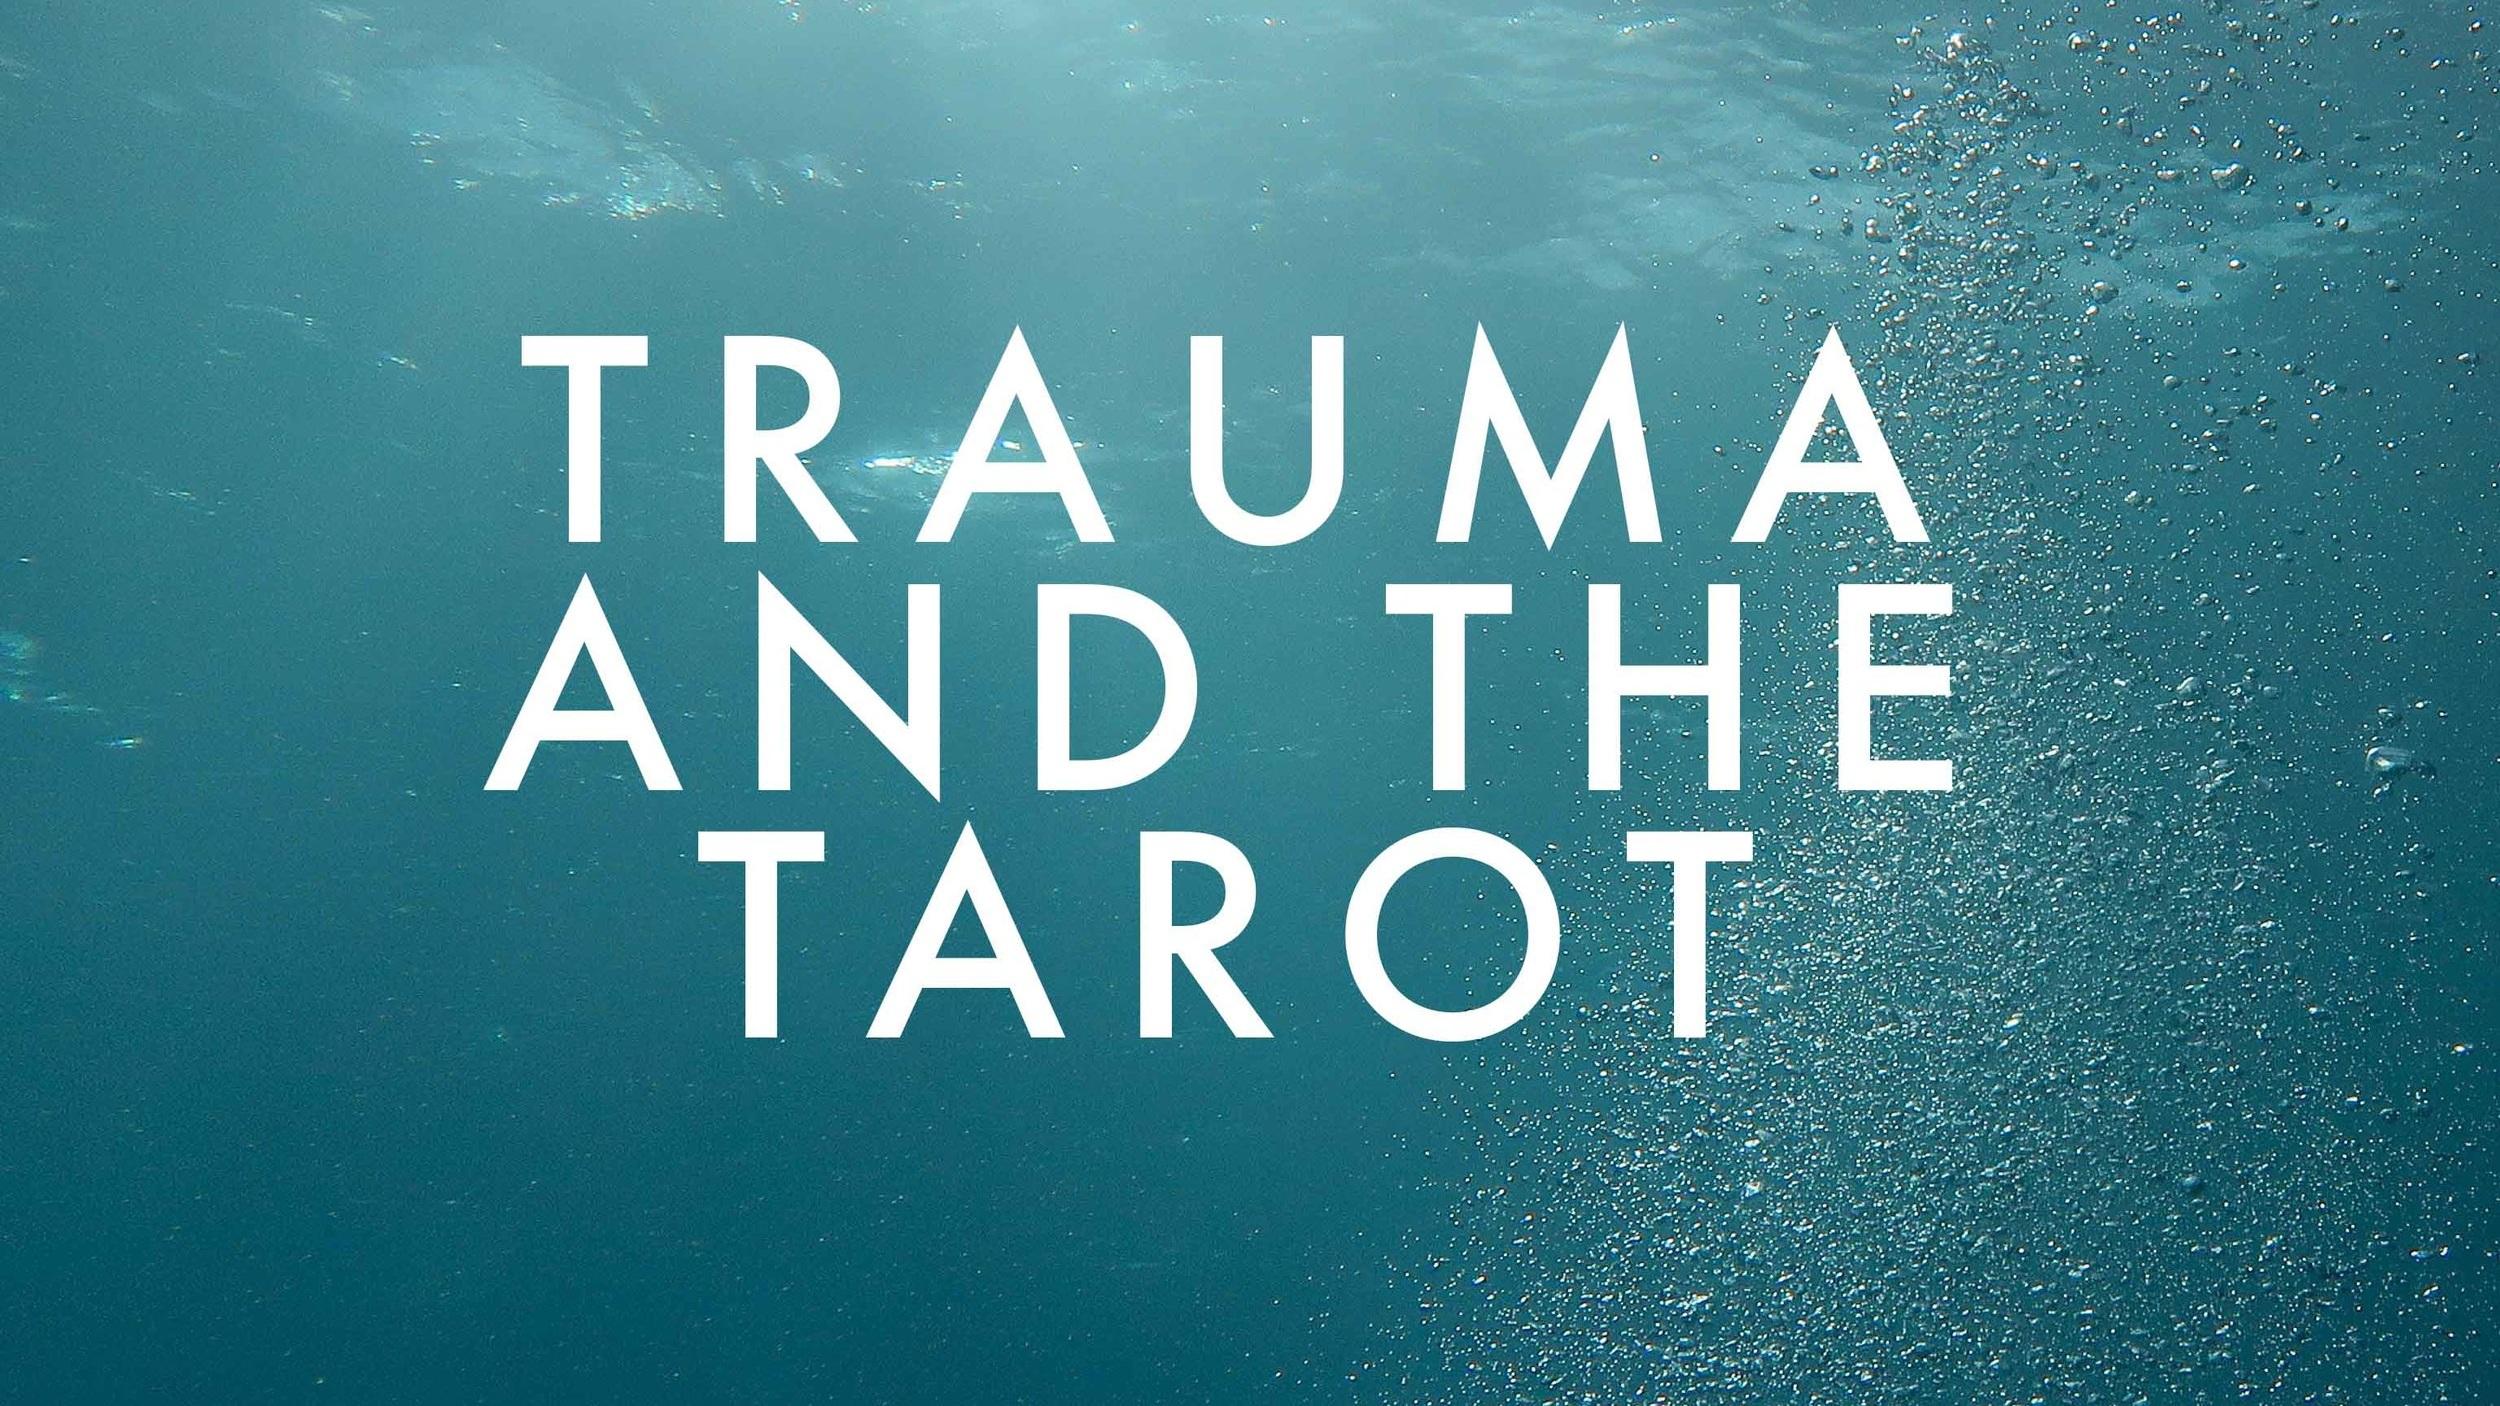 trauma+and+tarot.jpg